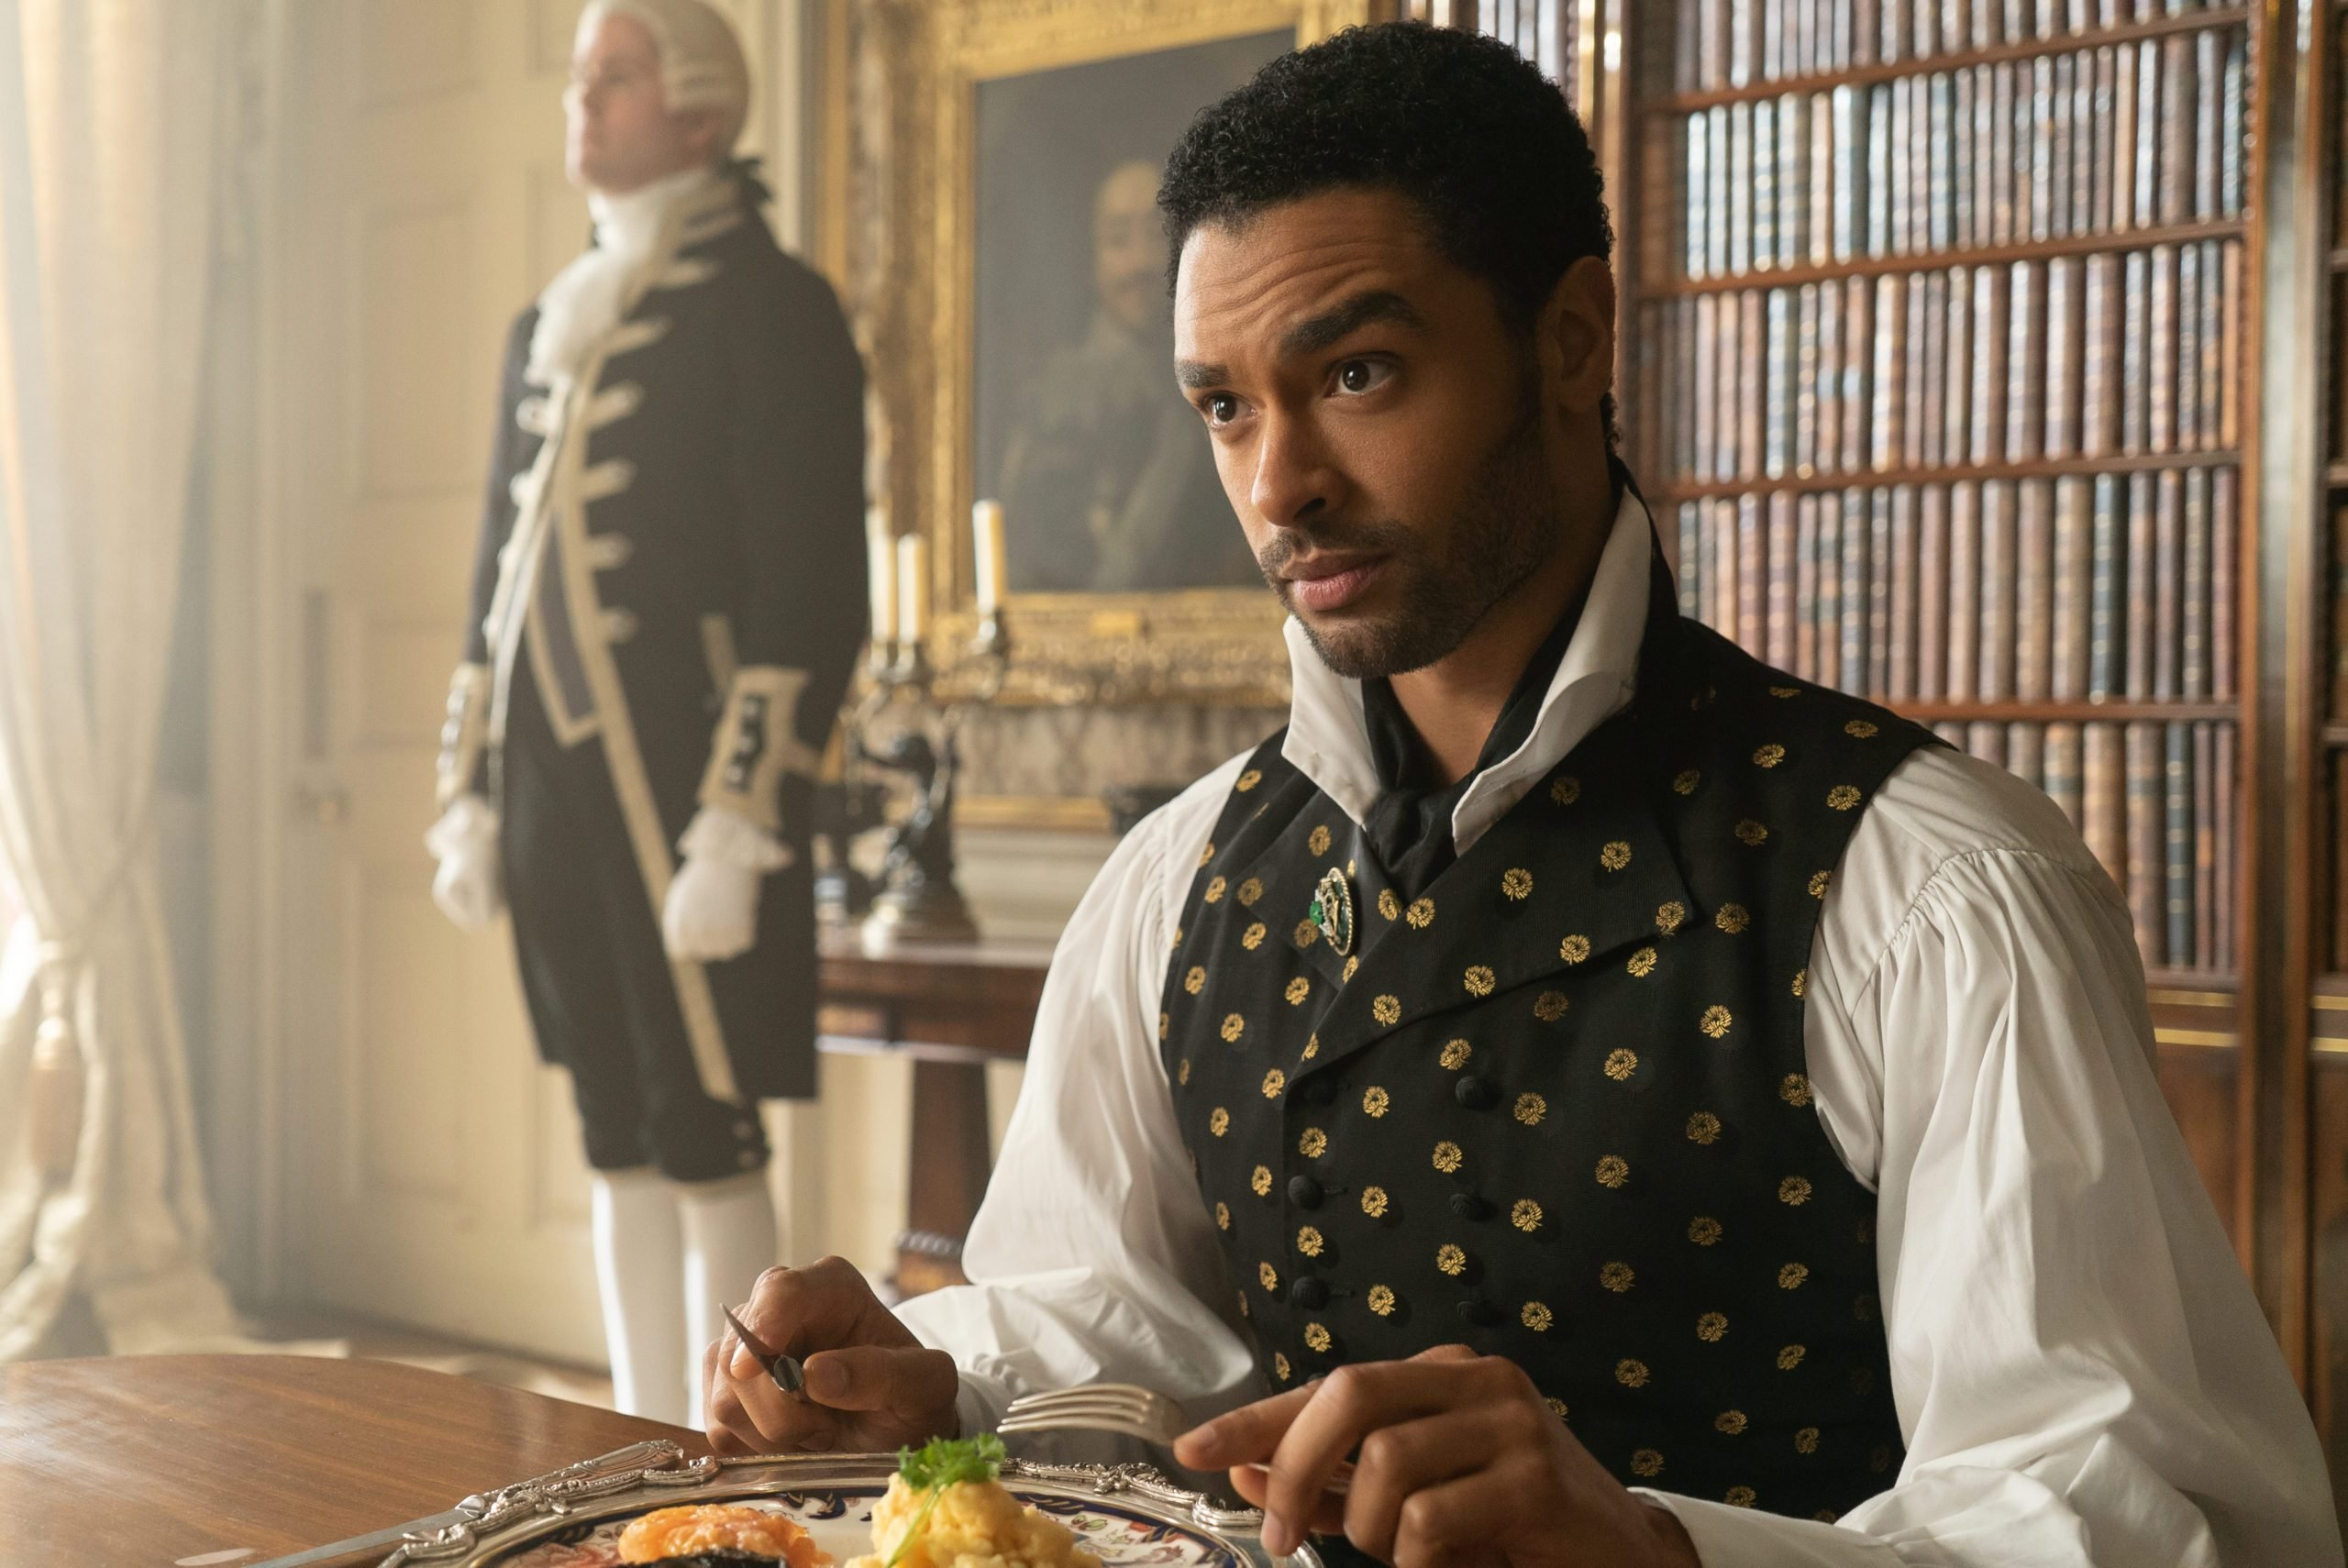 Simon, Duke of Hastings, in the Netflix show Bridgerton